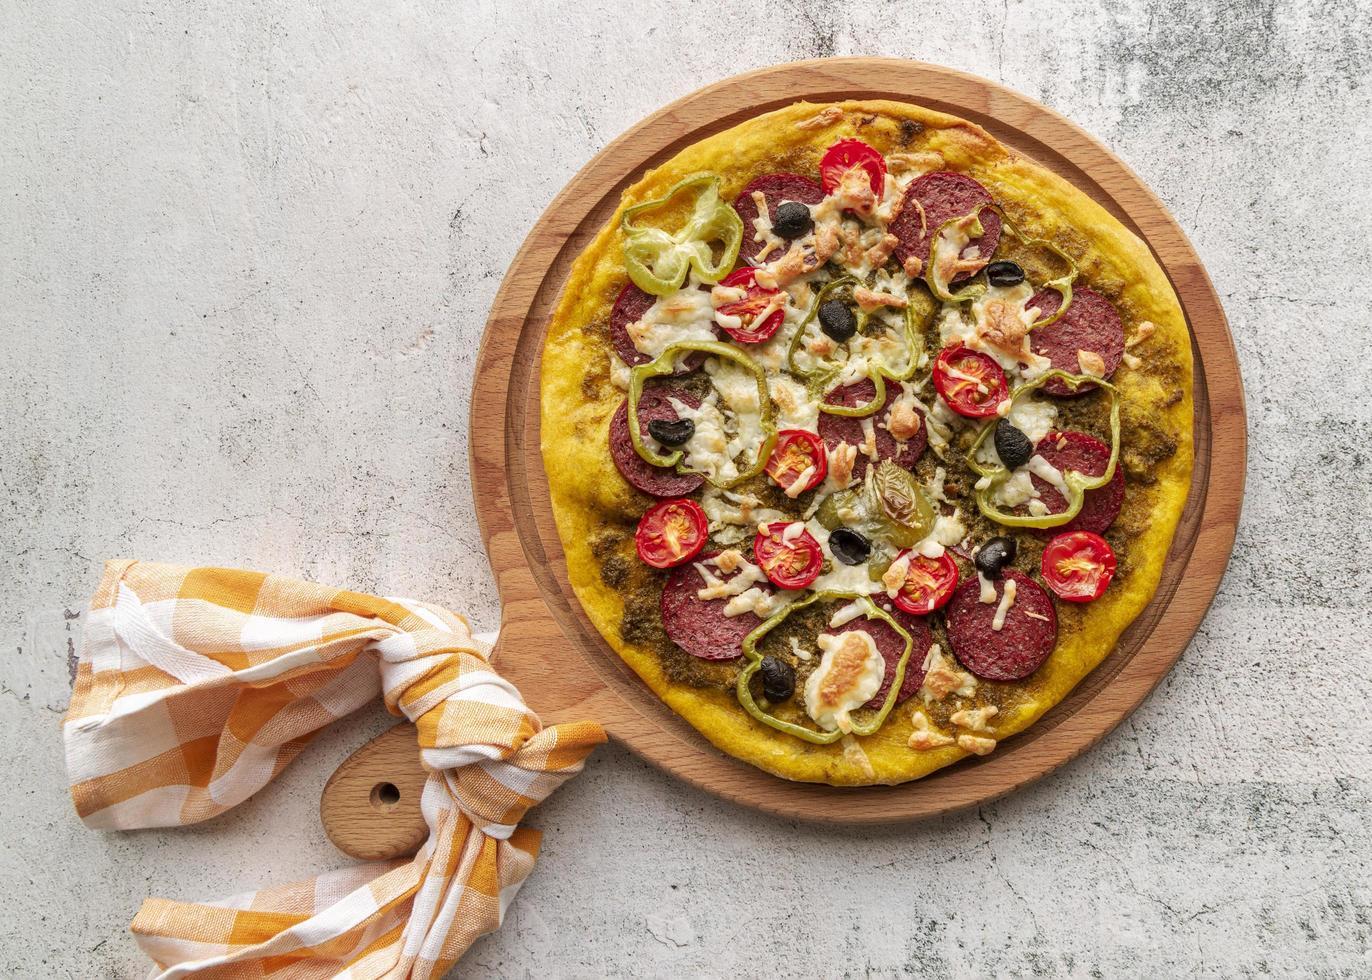 hemlagad pizza nybakad foto